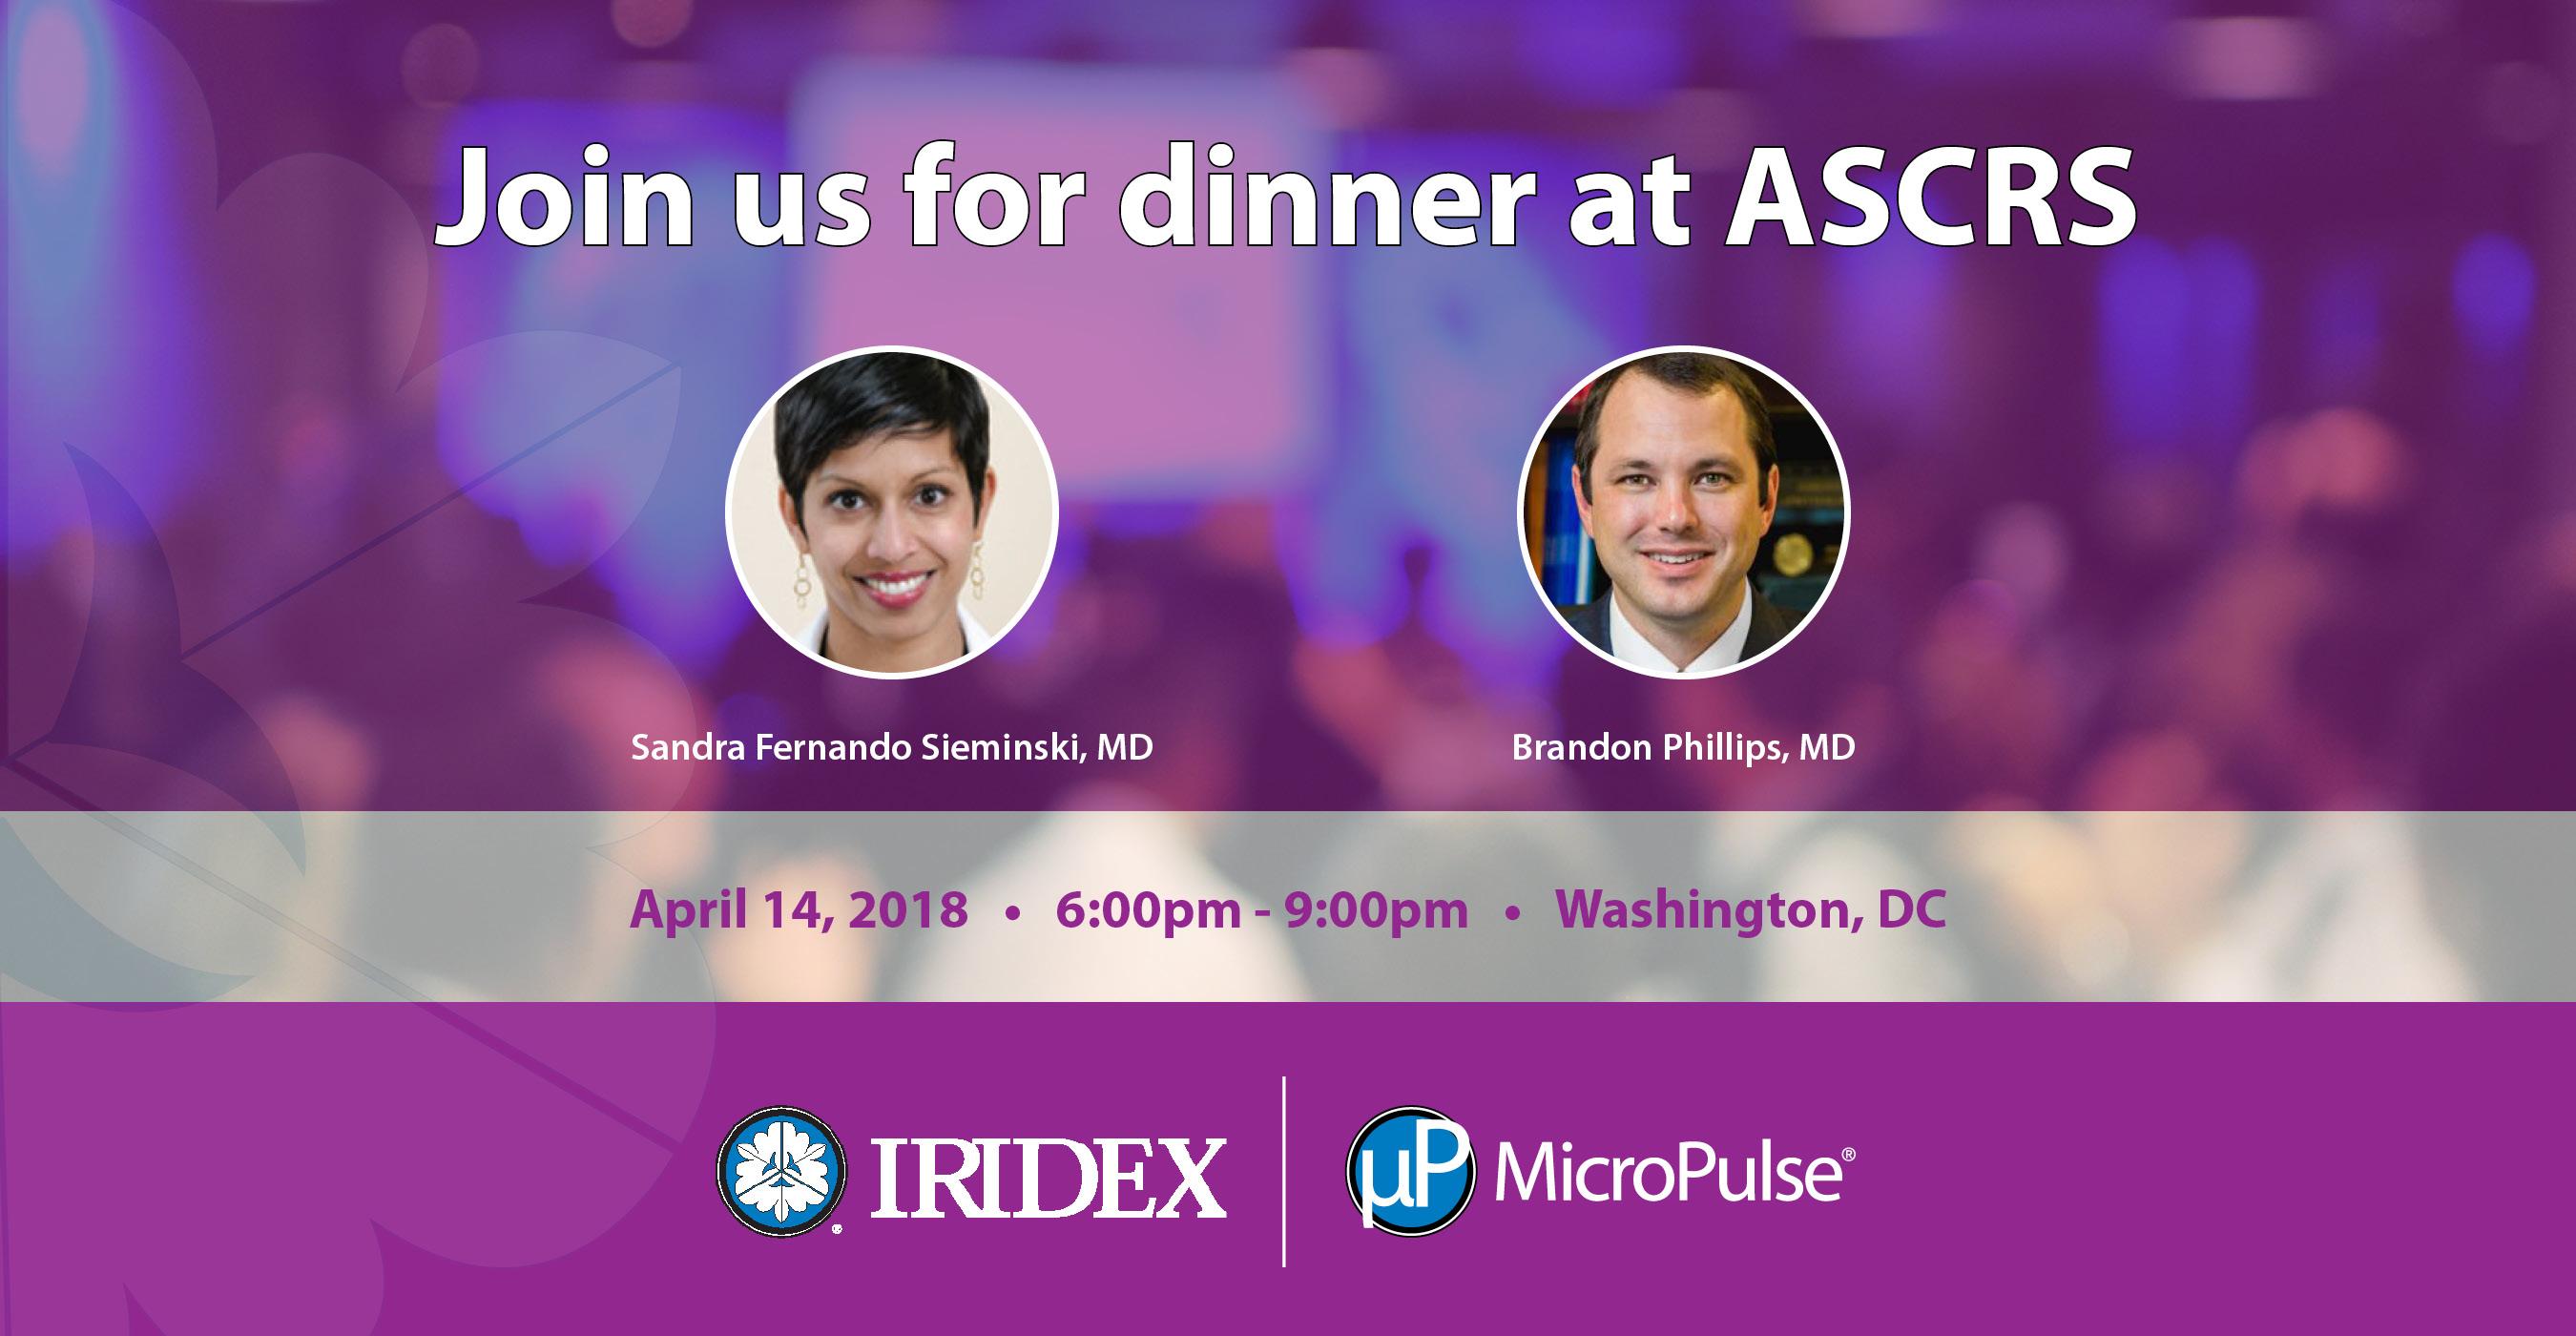 IRIDEX MicroPulse Dinner at ASCRS